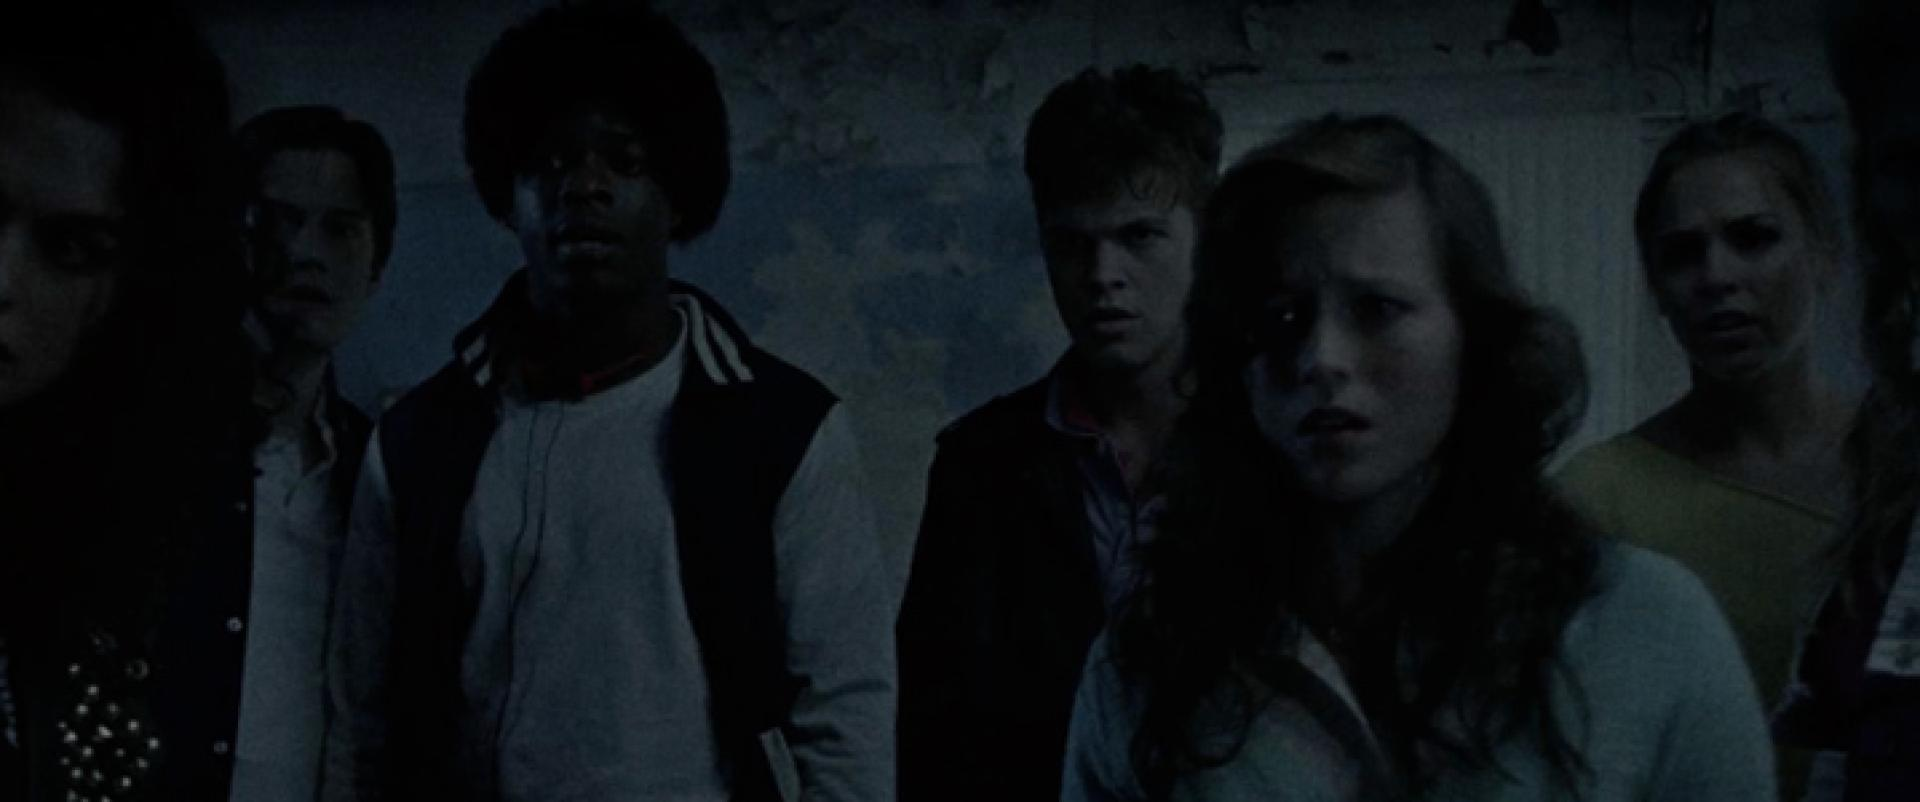 Lost After Dark: egy jelenet a filmből